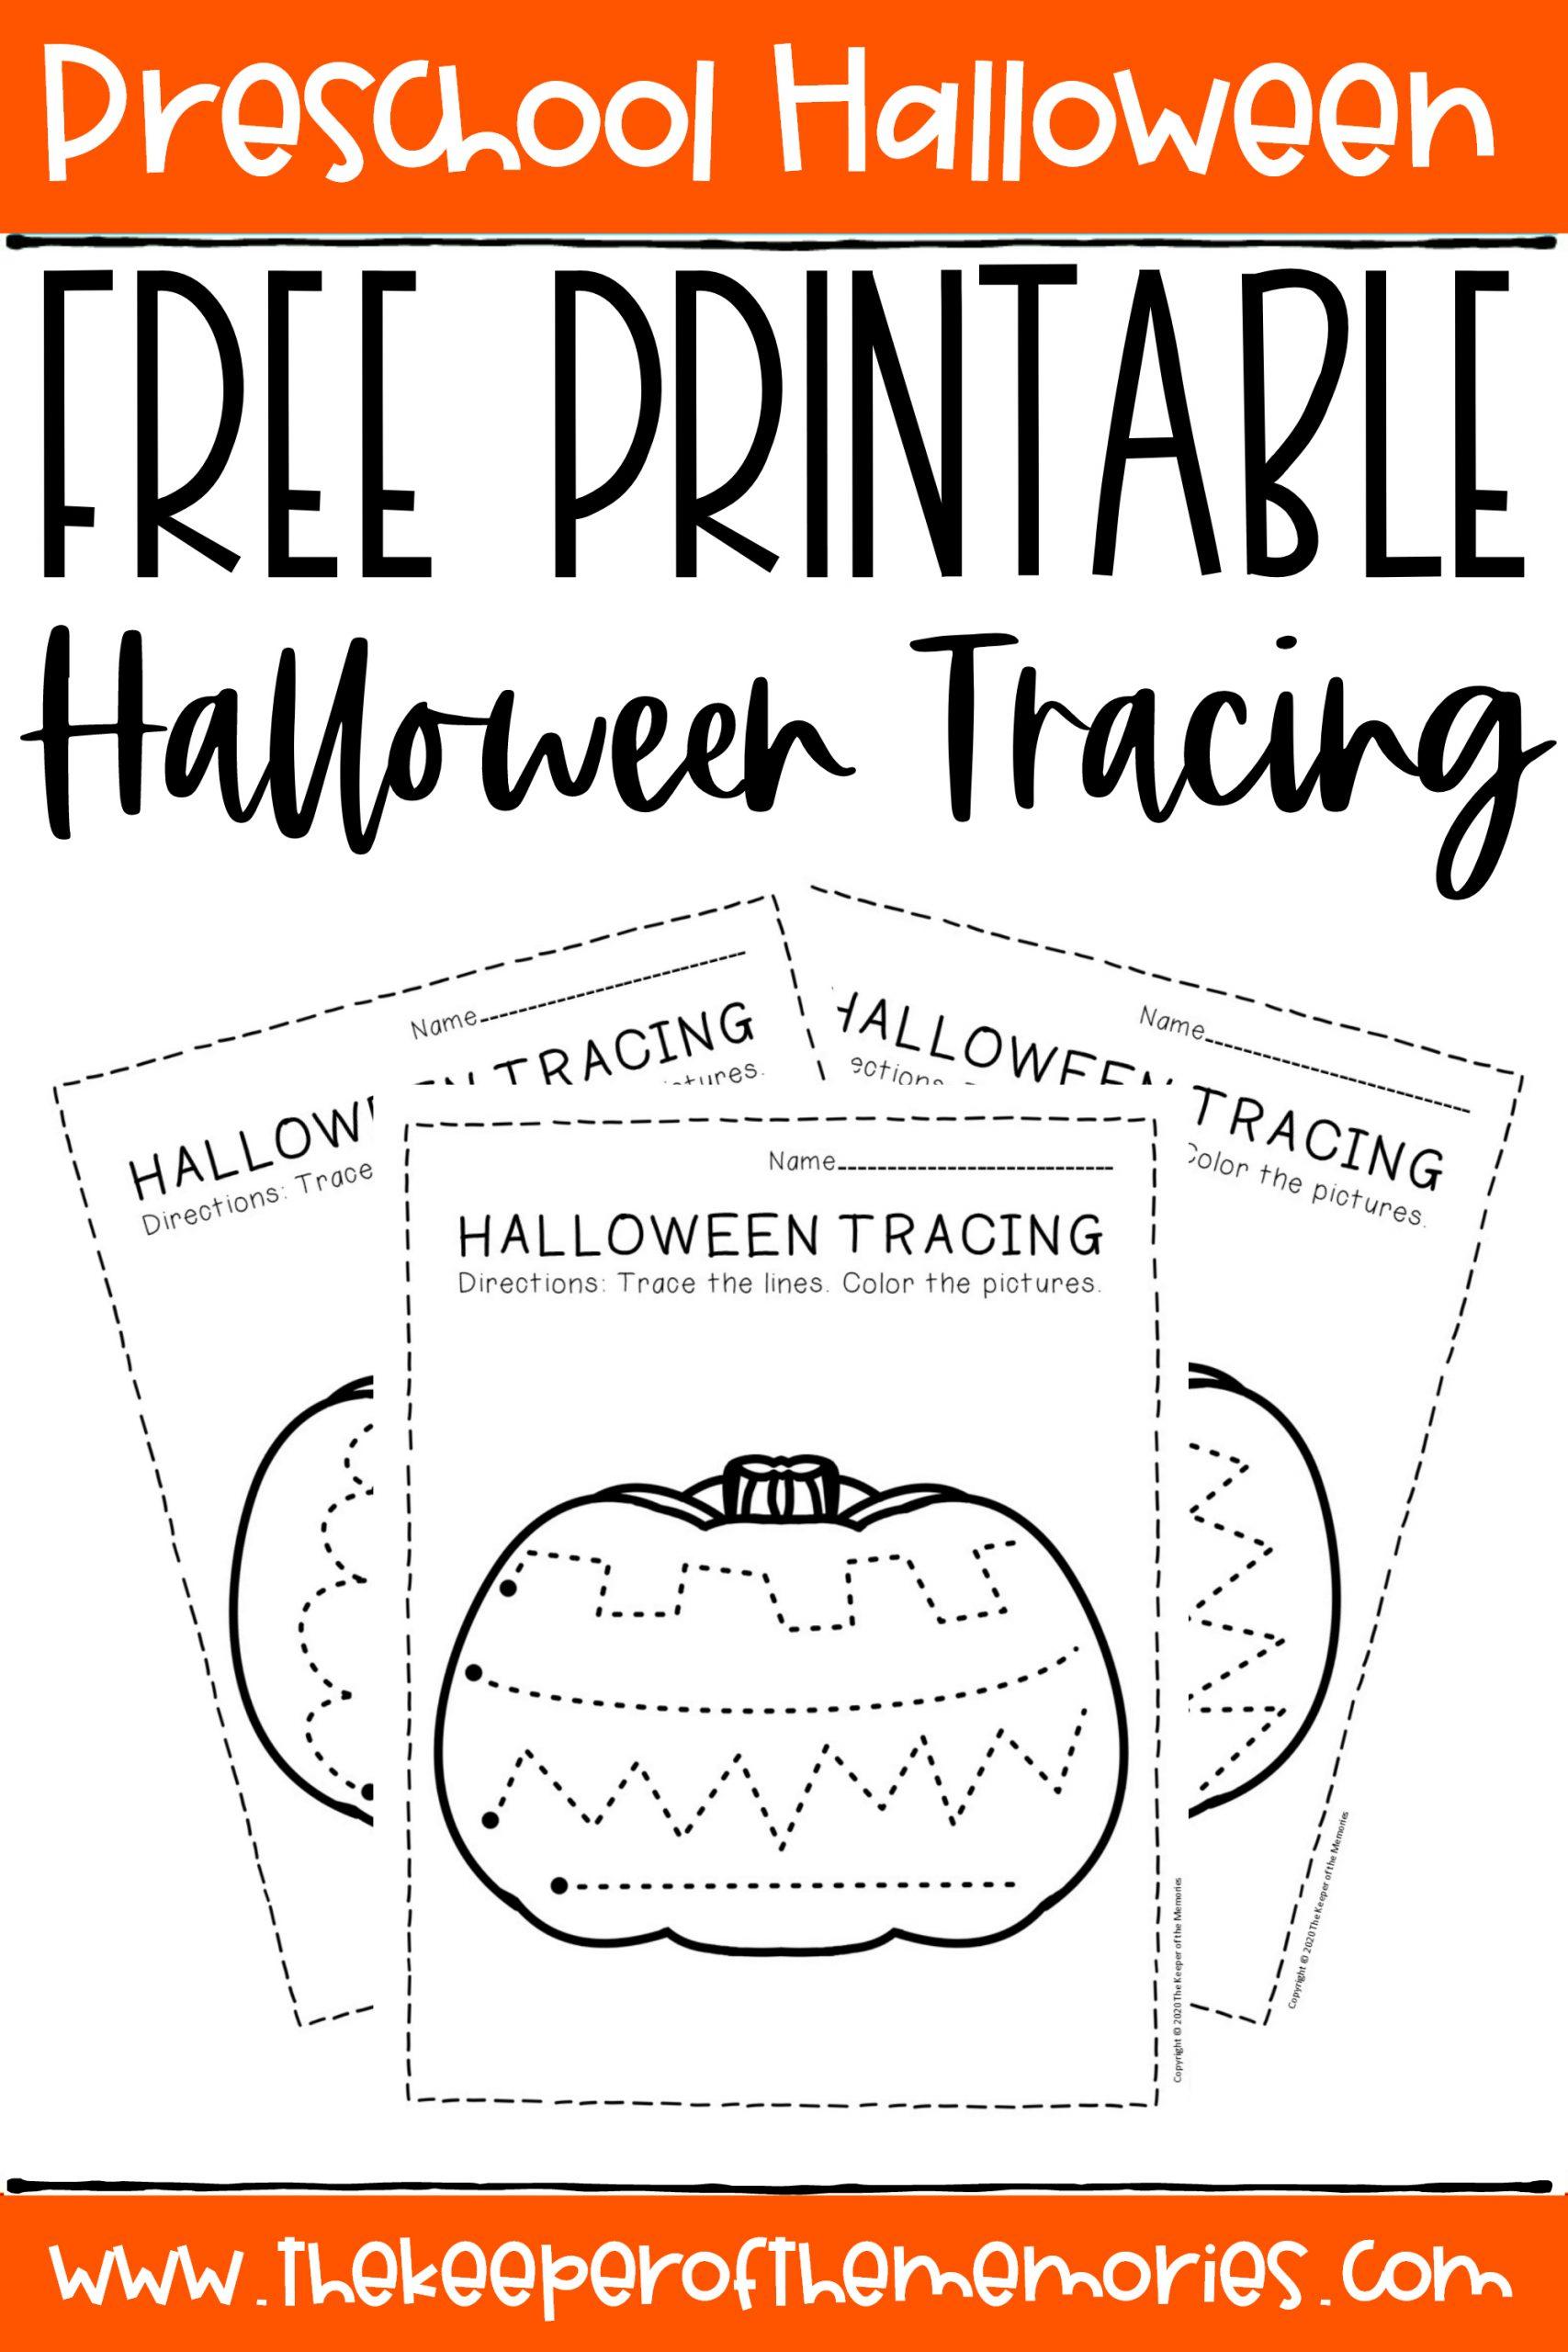 Free Printable Tracing Halloween Preschool Worksheets - The